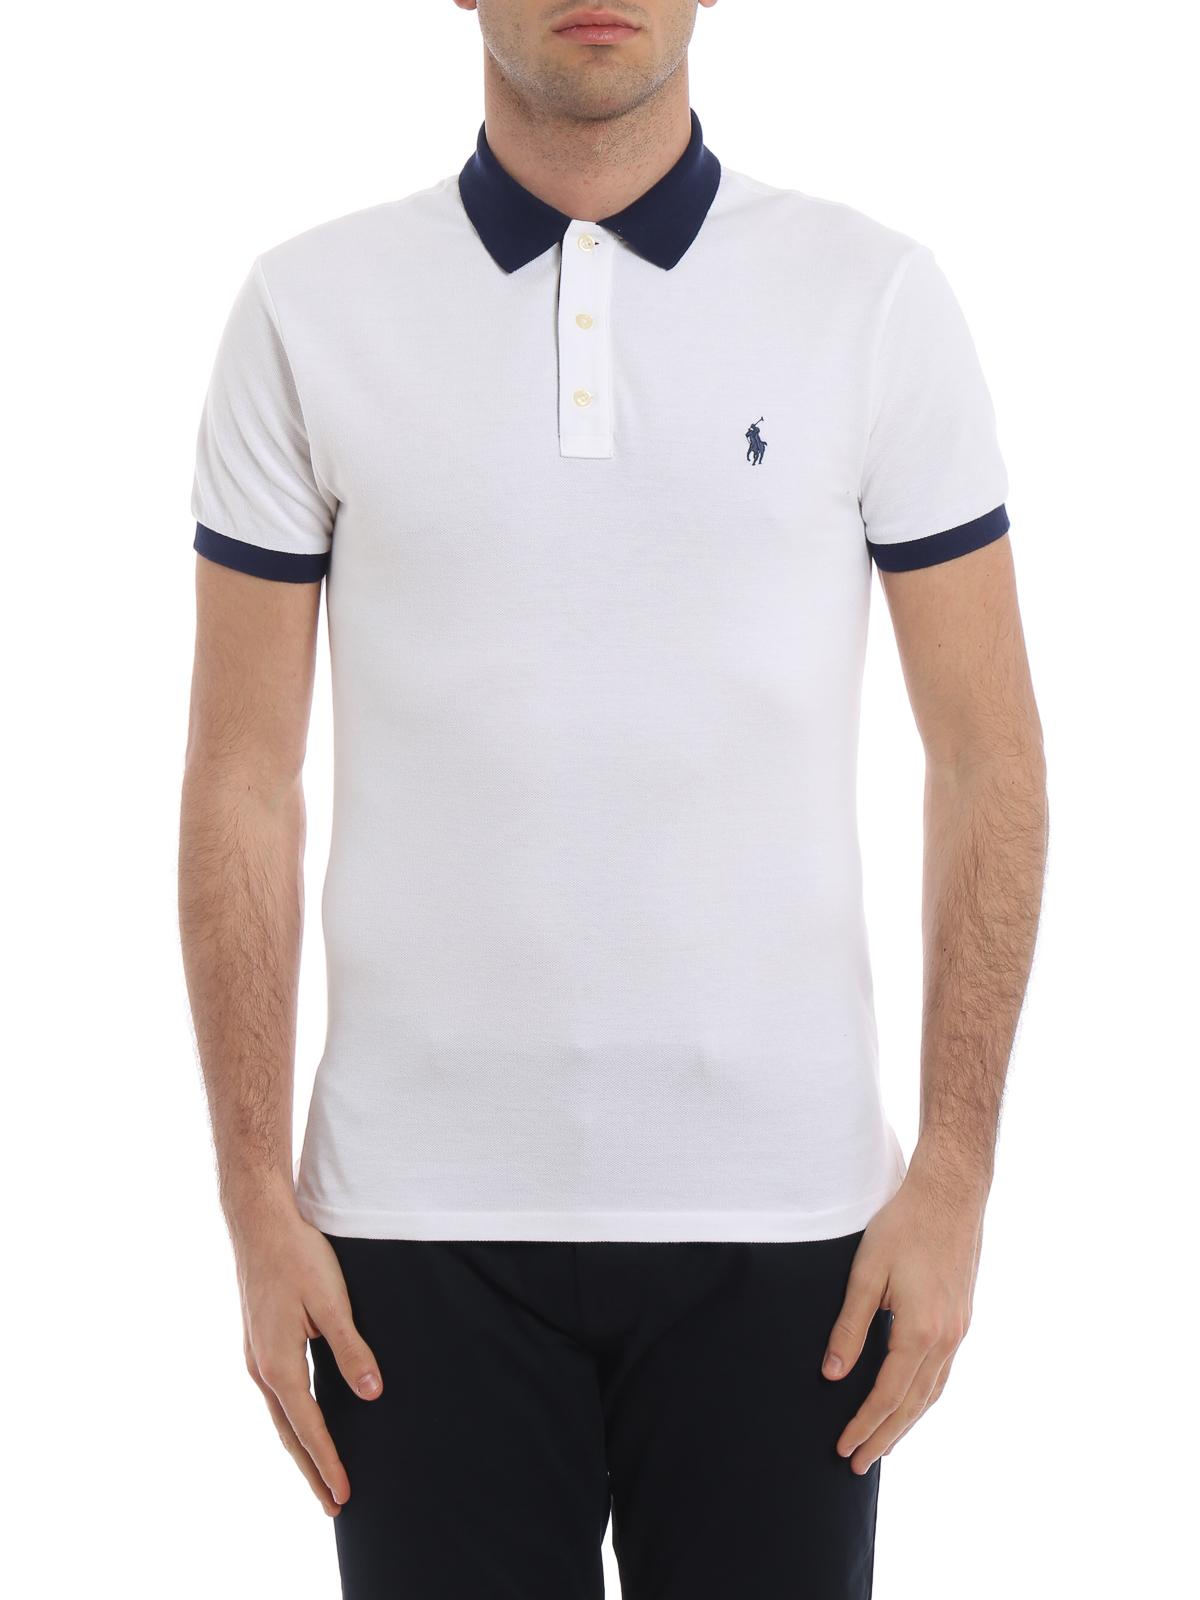 buy popular fe798 fec51 Polo Ralph Lauren - Poloshirt - Weiß - Poloshirts - 710752591003